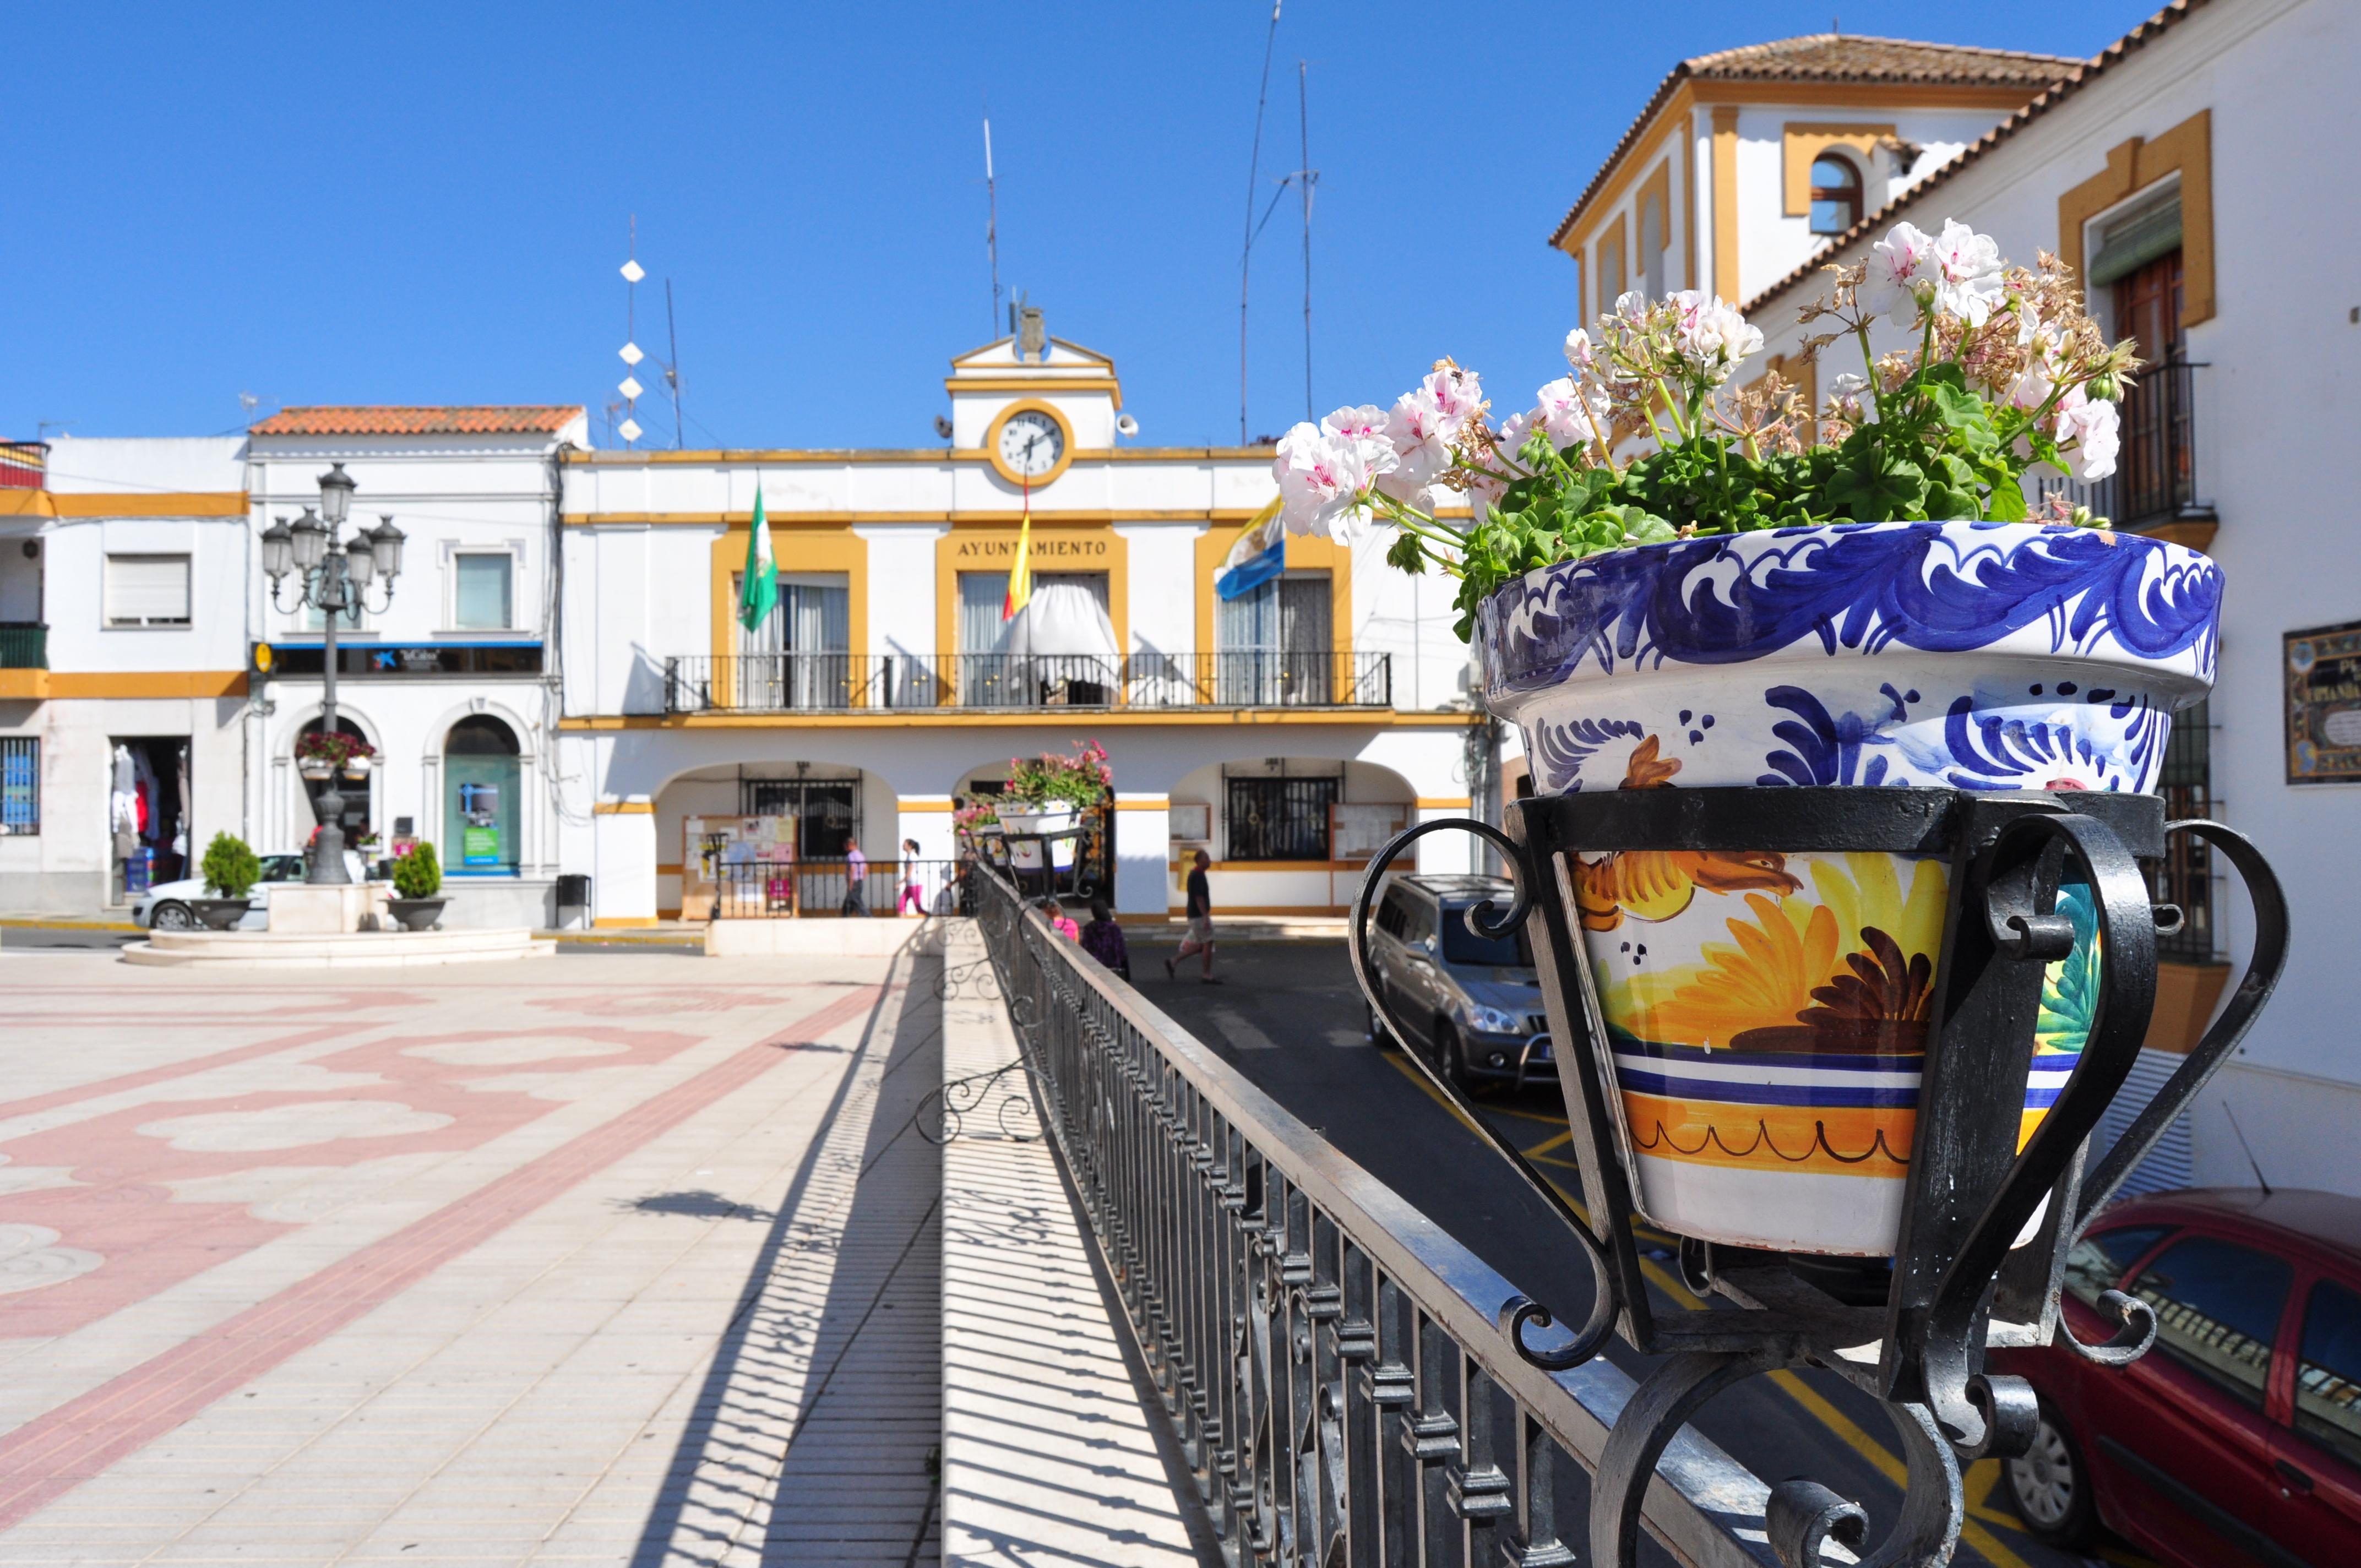 File:Palos de la Frontera - 004 (30624827191).jpg - Wikimedia Commons